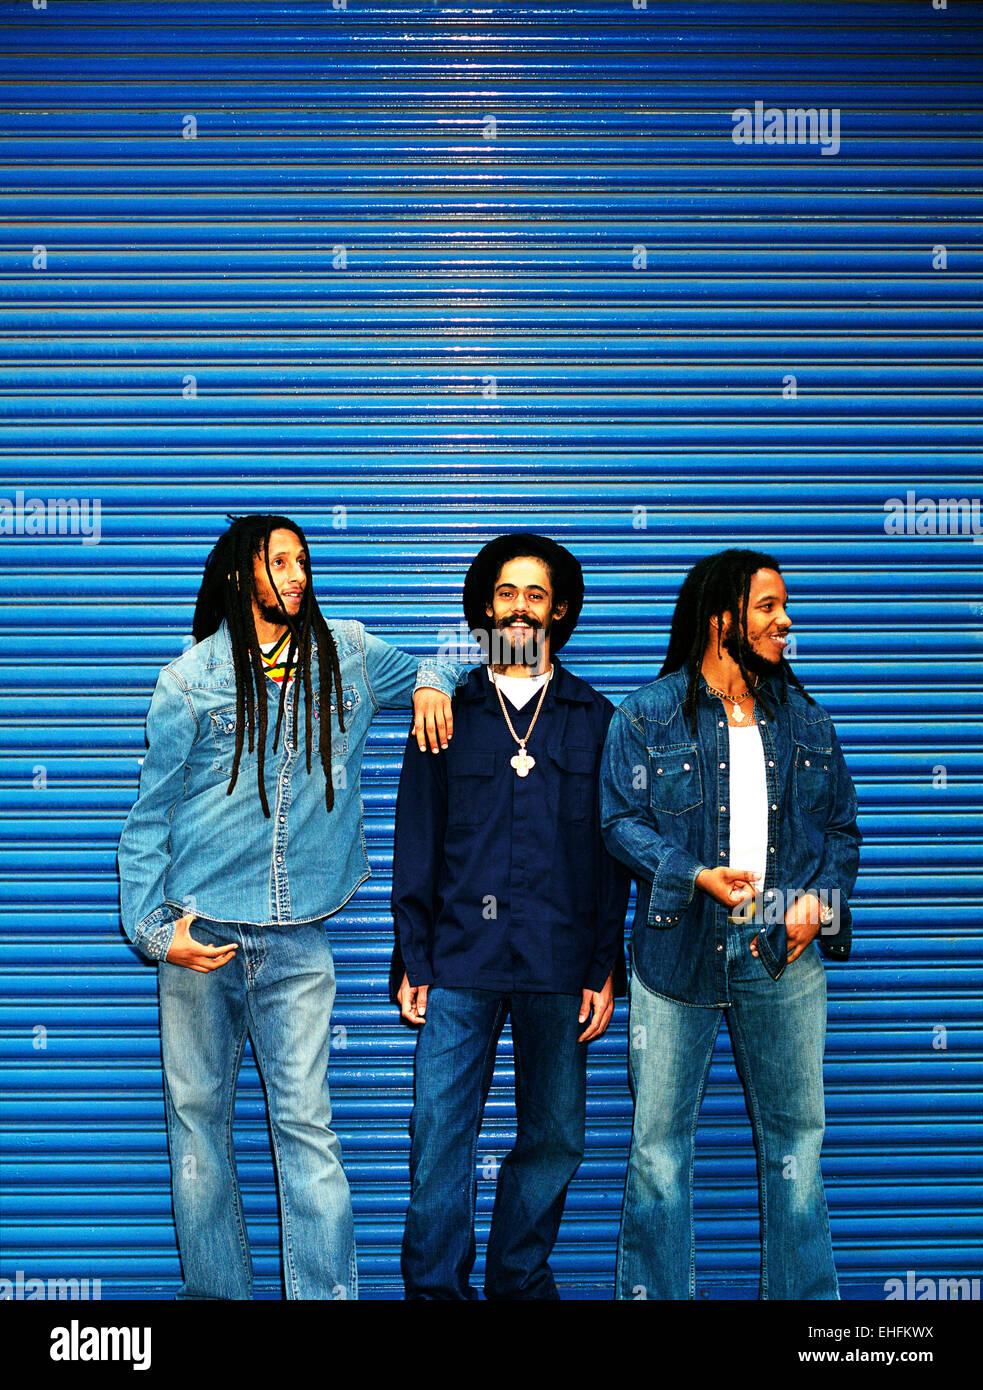 Portrait of Julian Damian and Steven Marley. Stock Photo